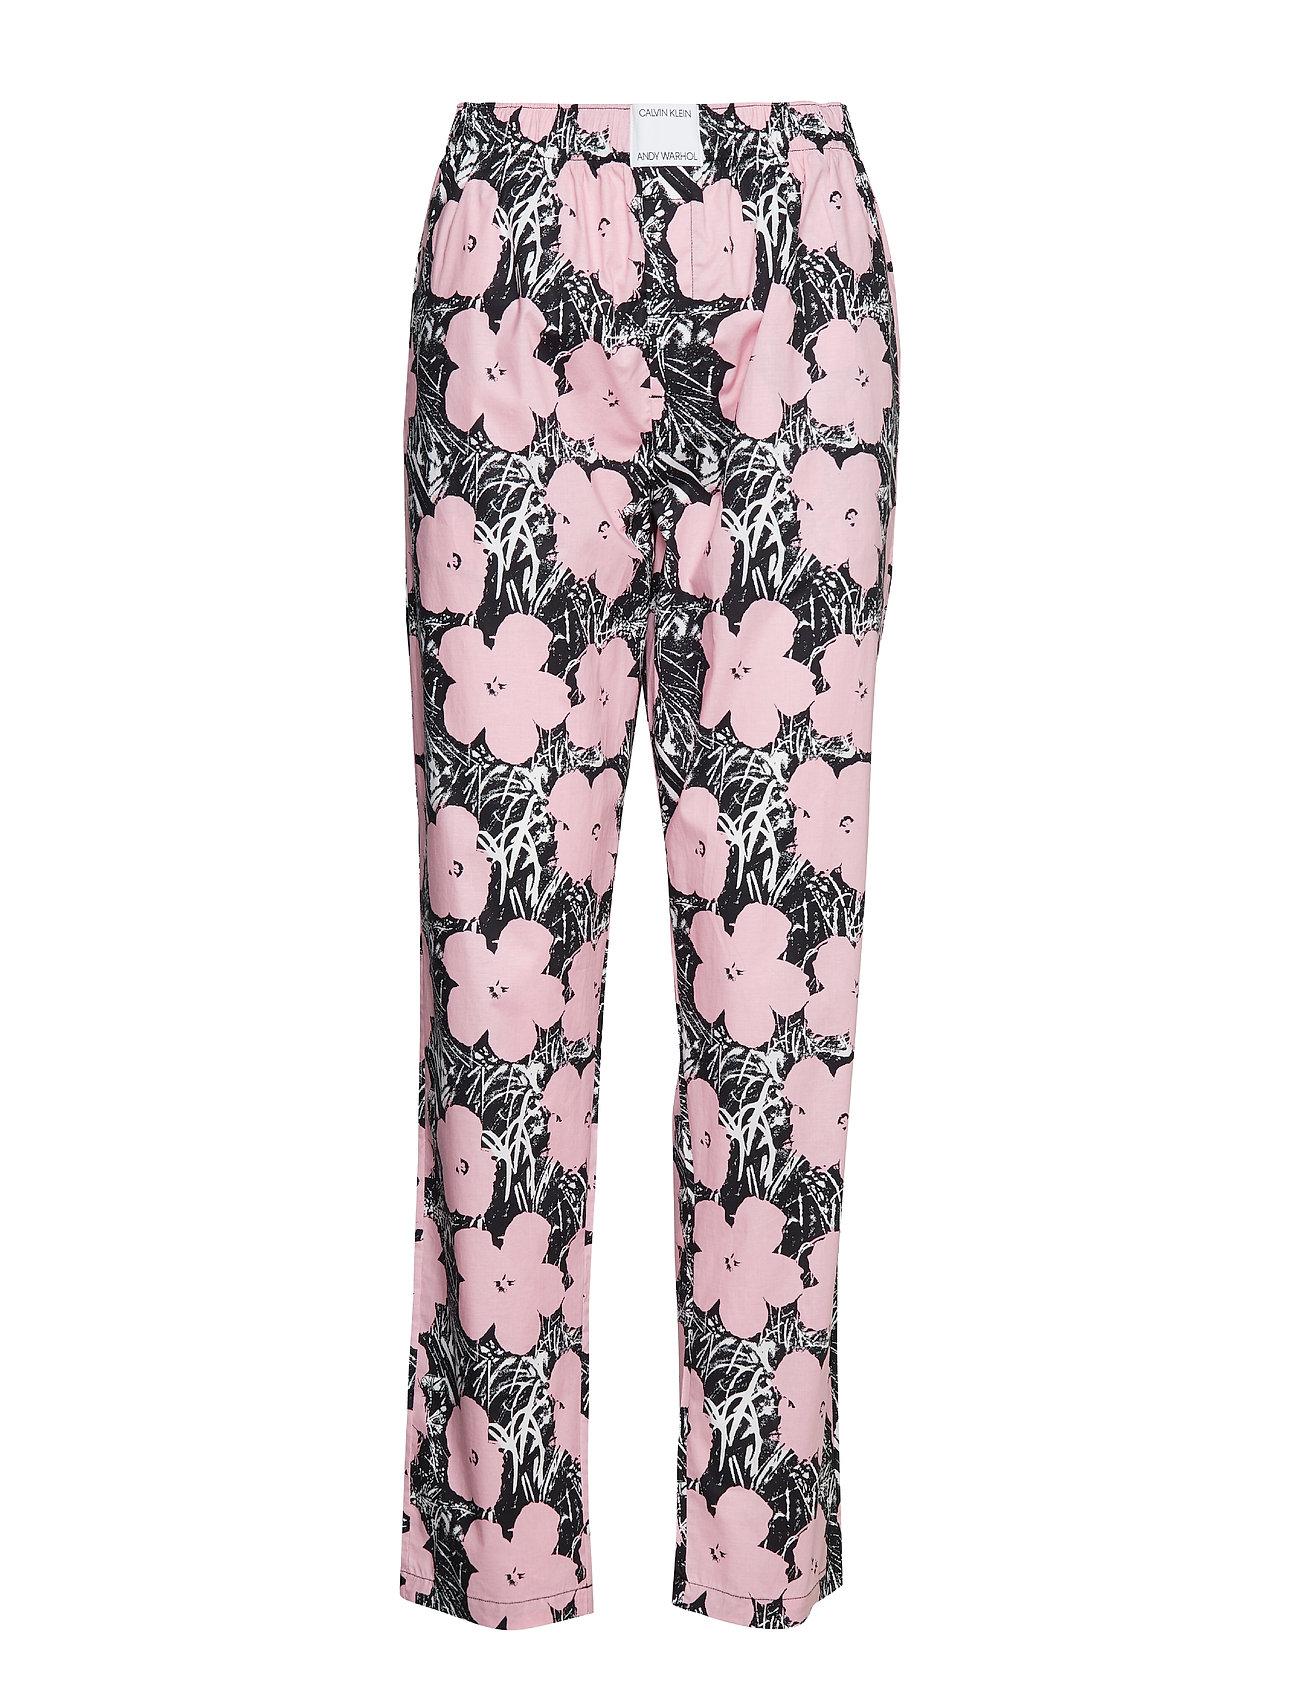 Calvin Klein SLEEP PANT (UNISEX) - AWH_FLOWERS LIGHT PINK